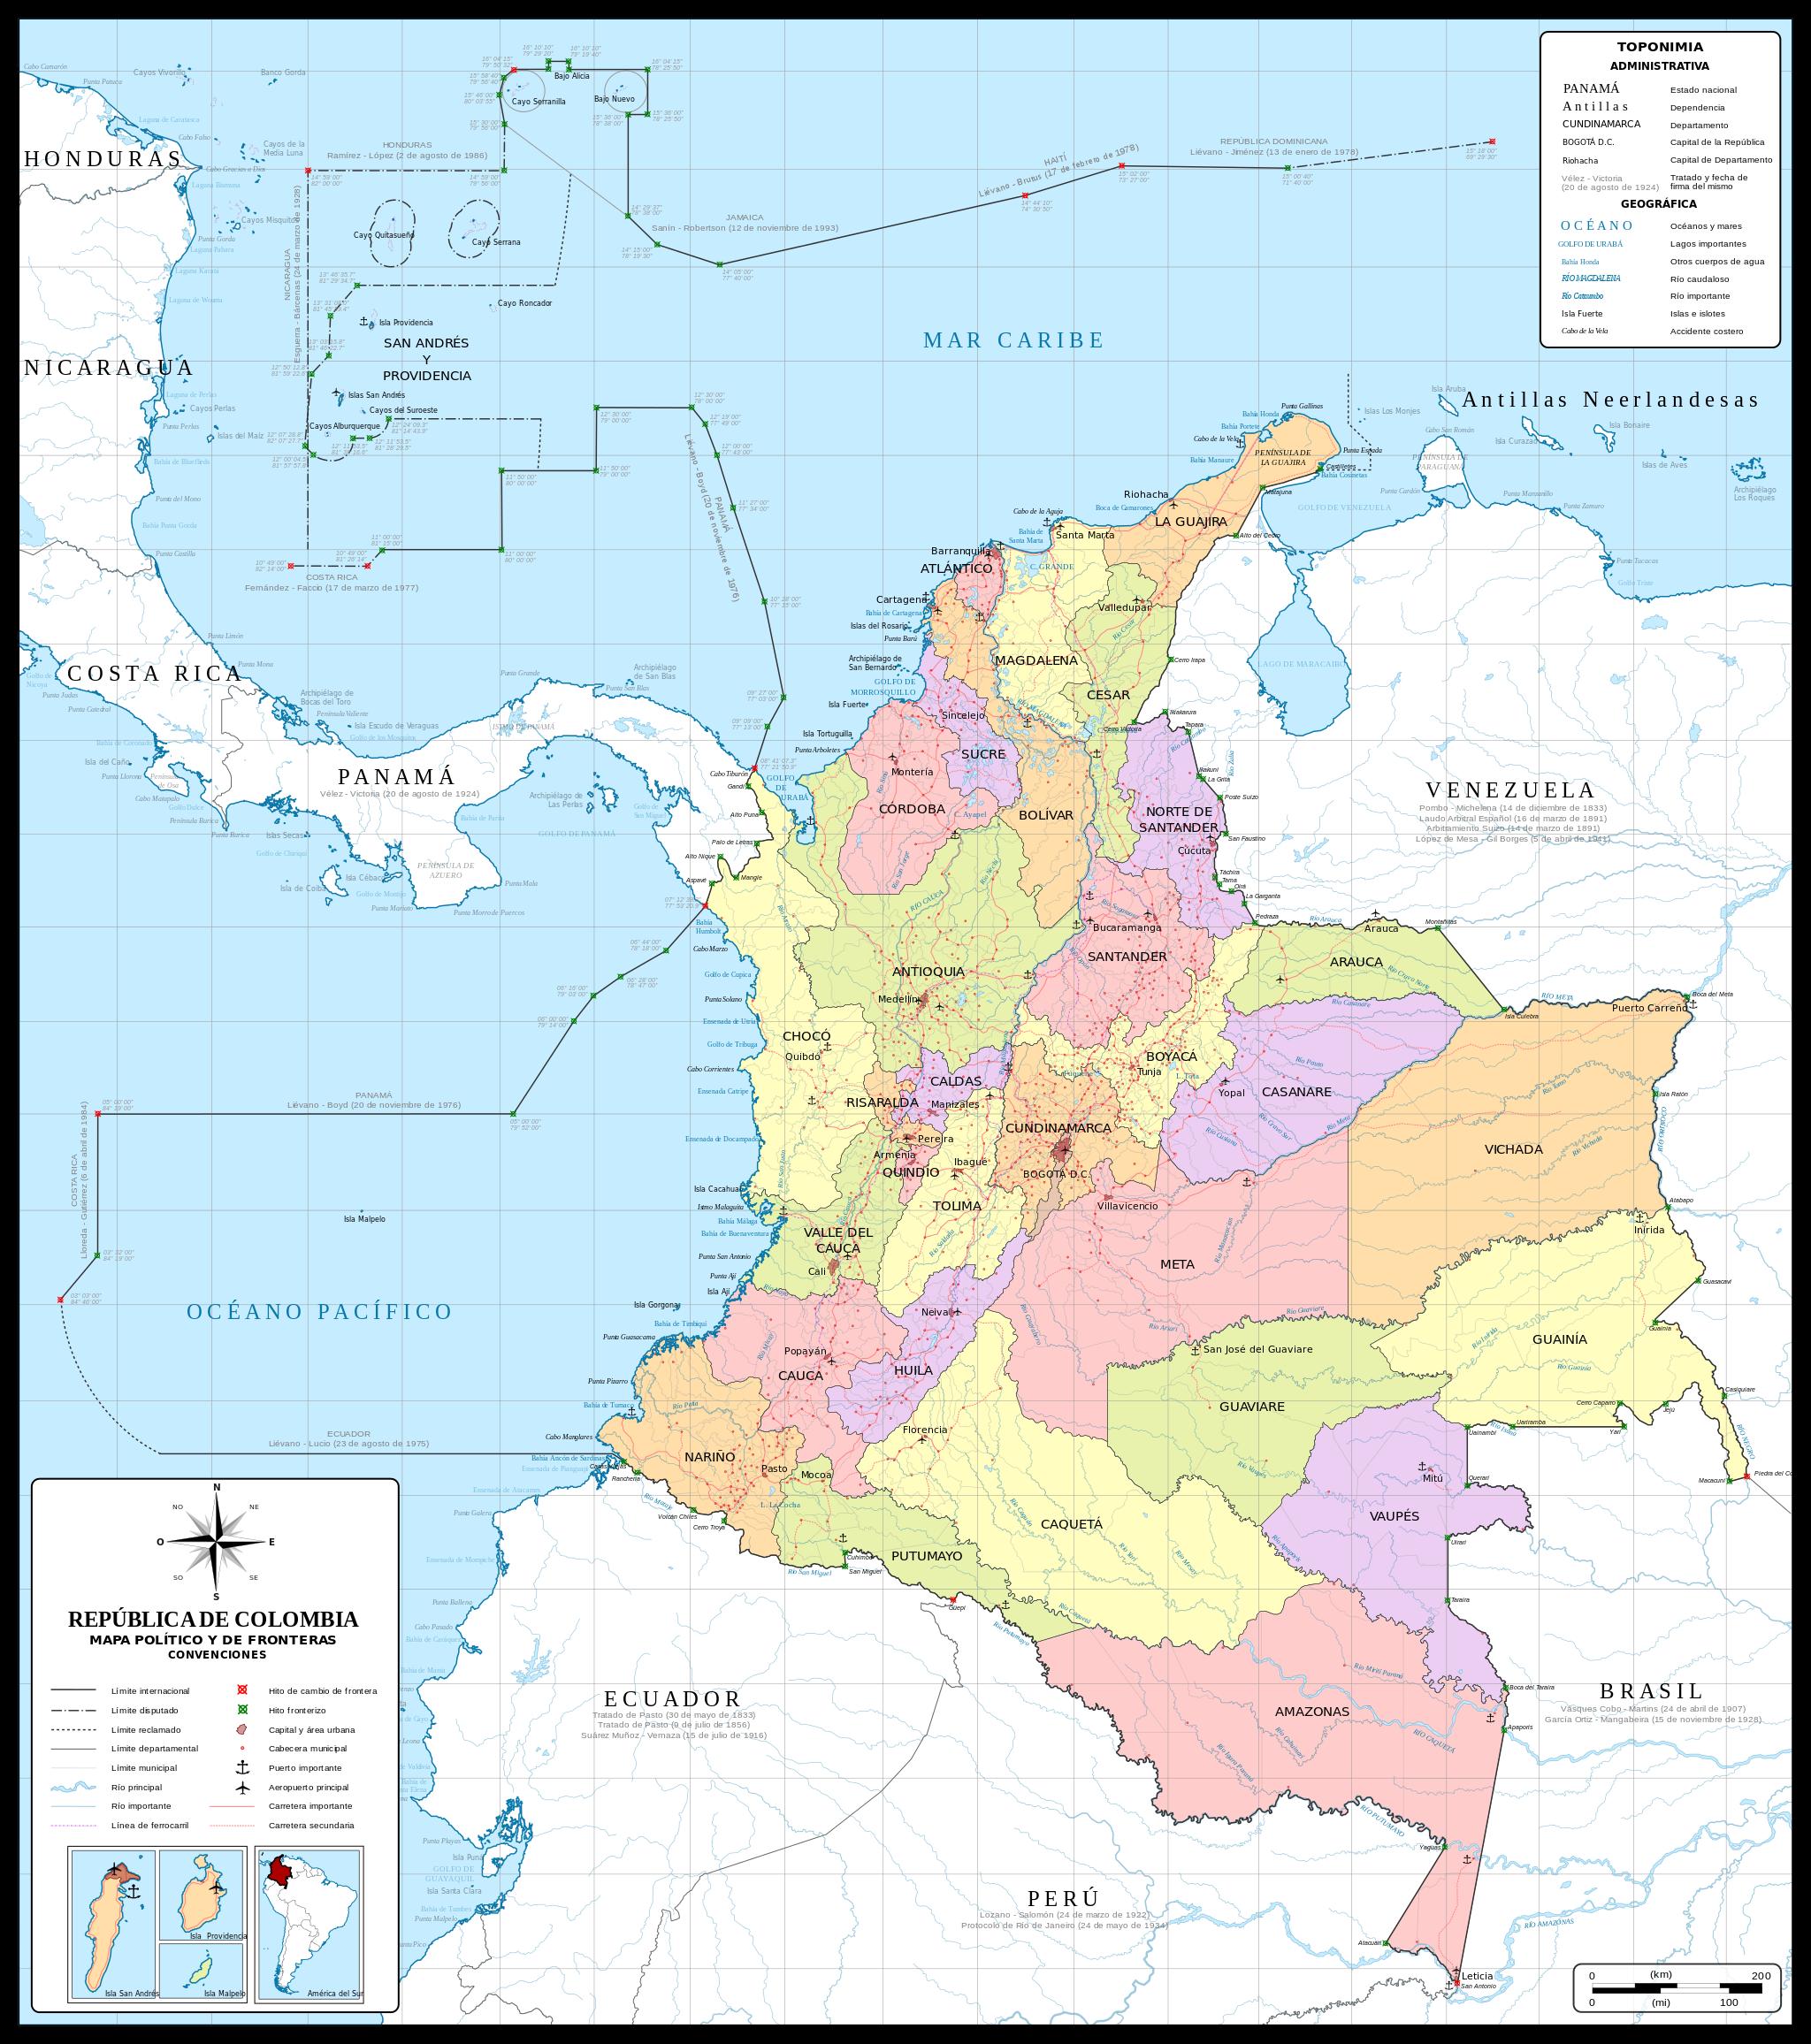 Colombie - administrative • Carte • PopulationData.net